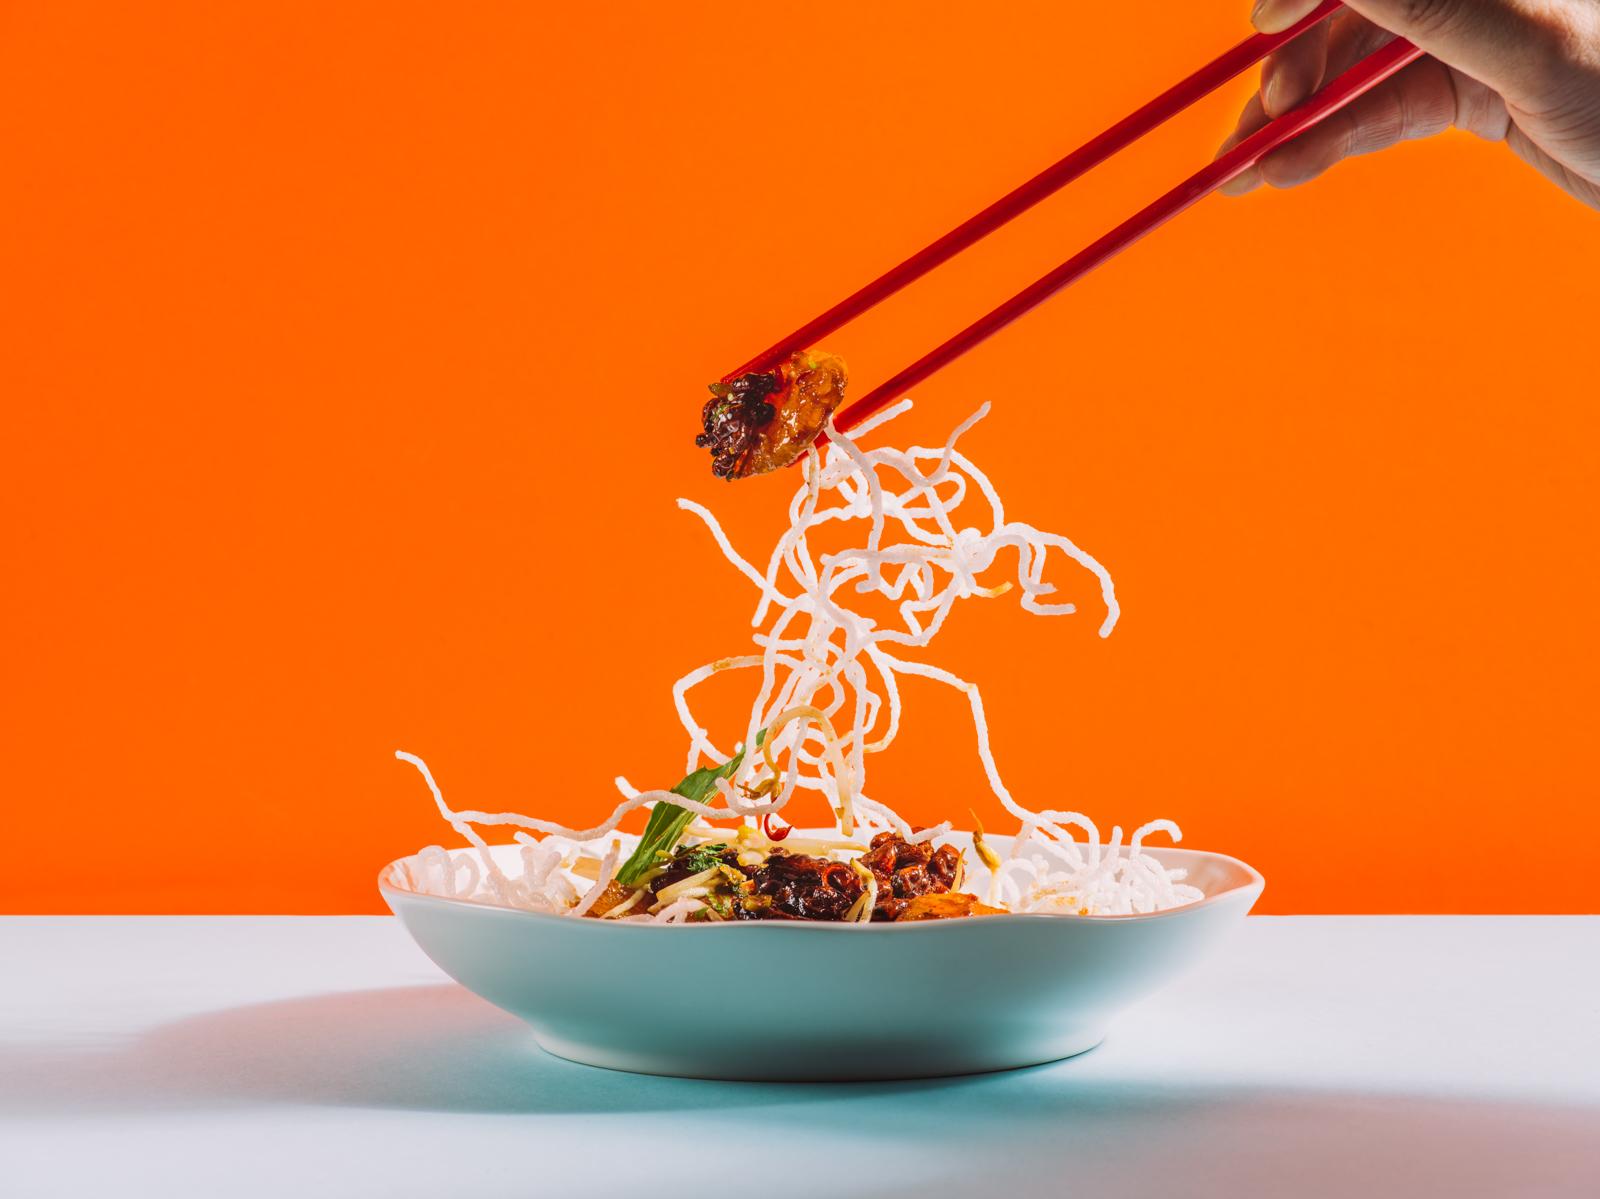 Rice-and-Gold-Food-All-Good-NYC-Nick-Johnson-Photography-26.JPG